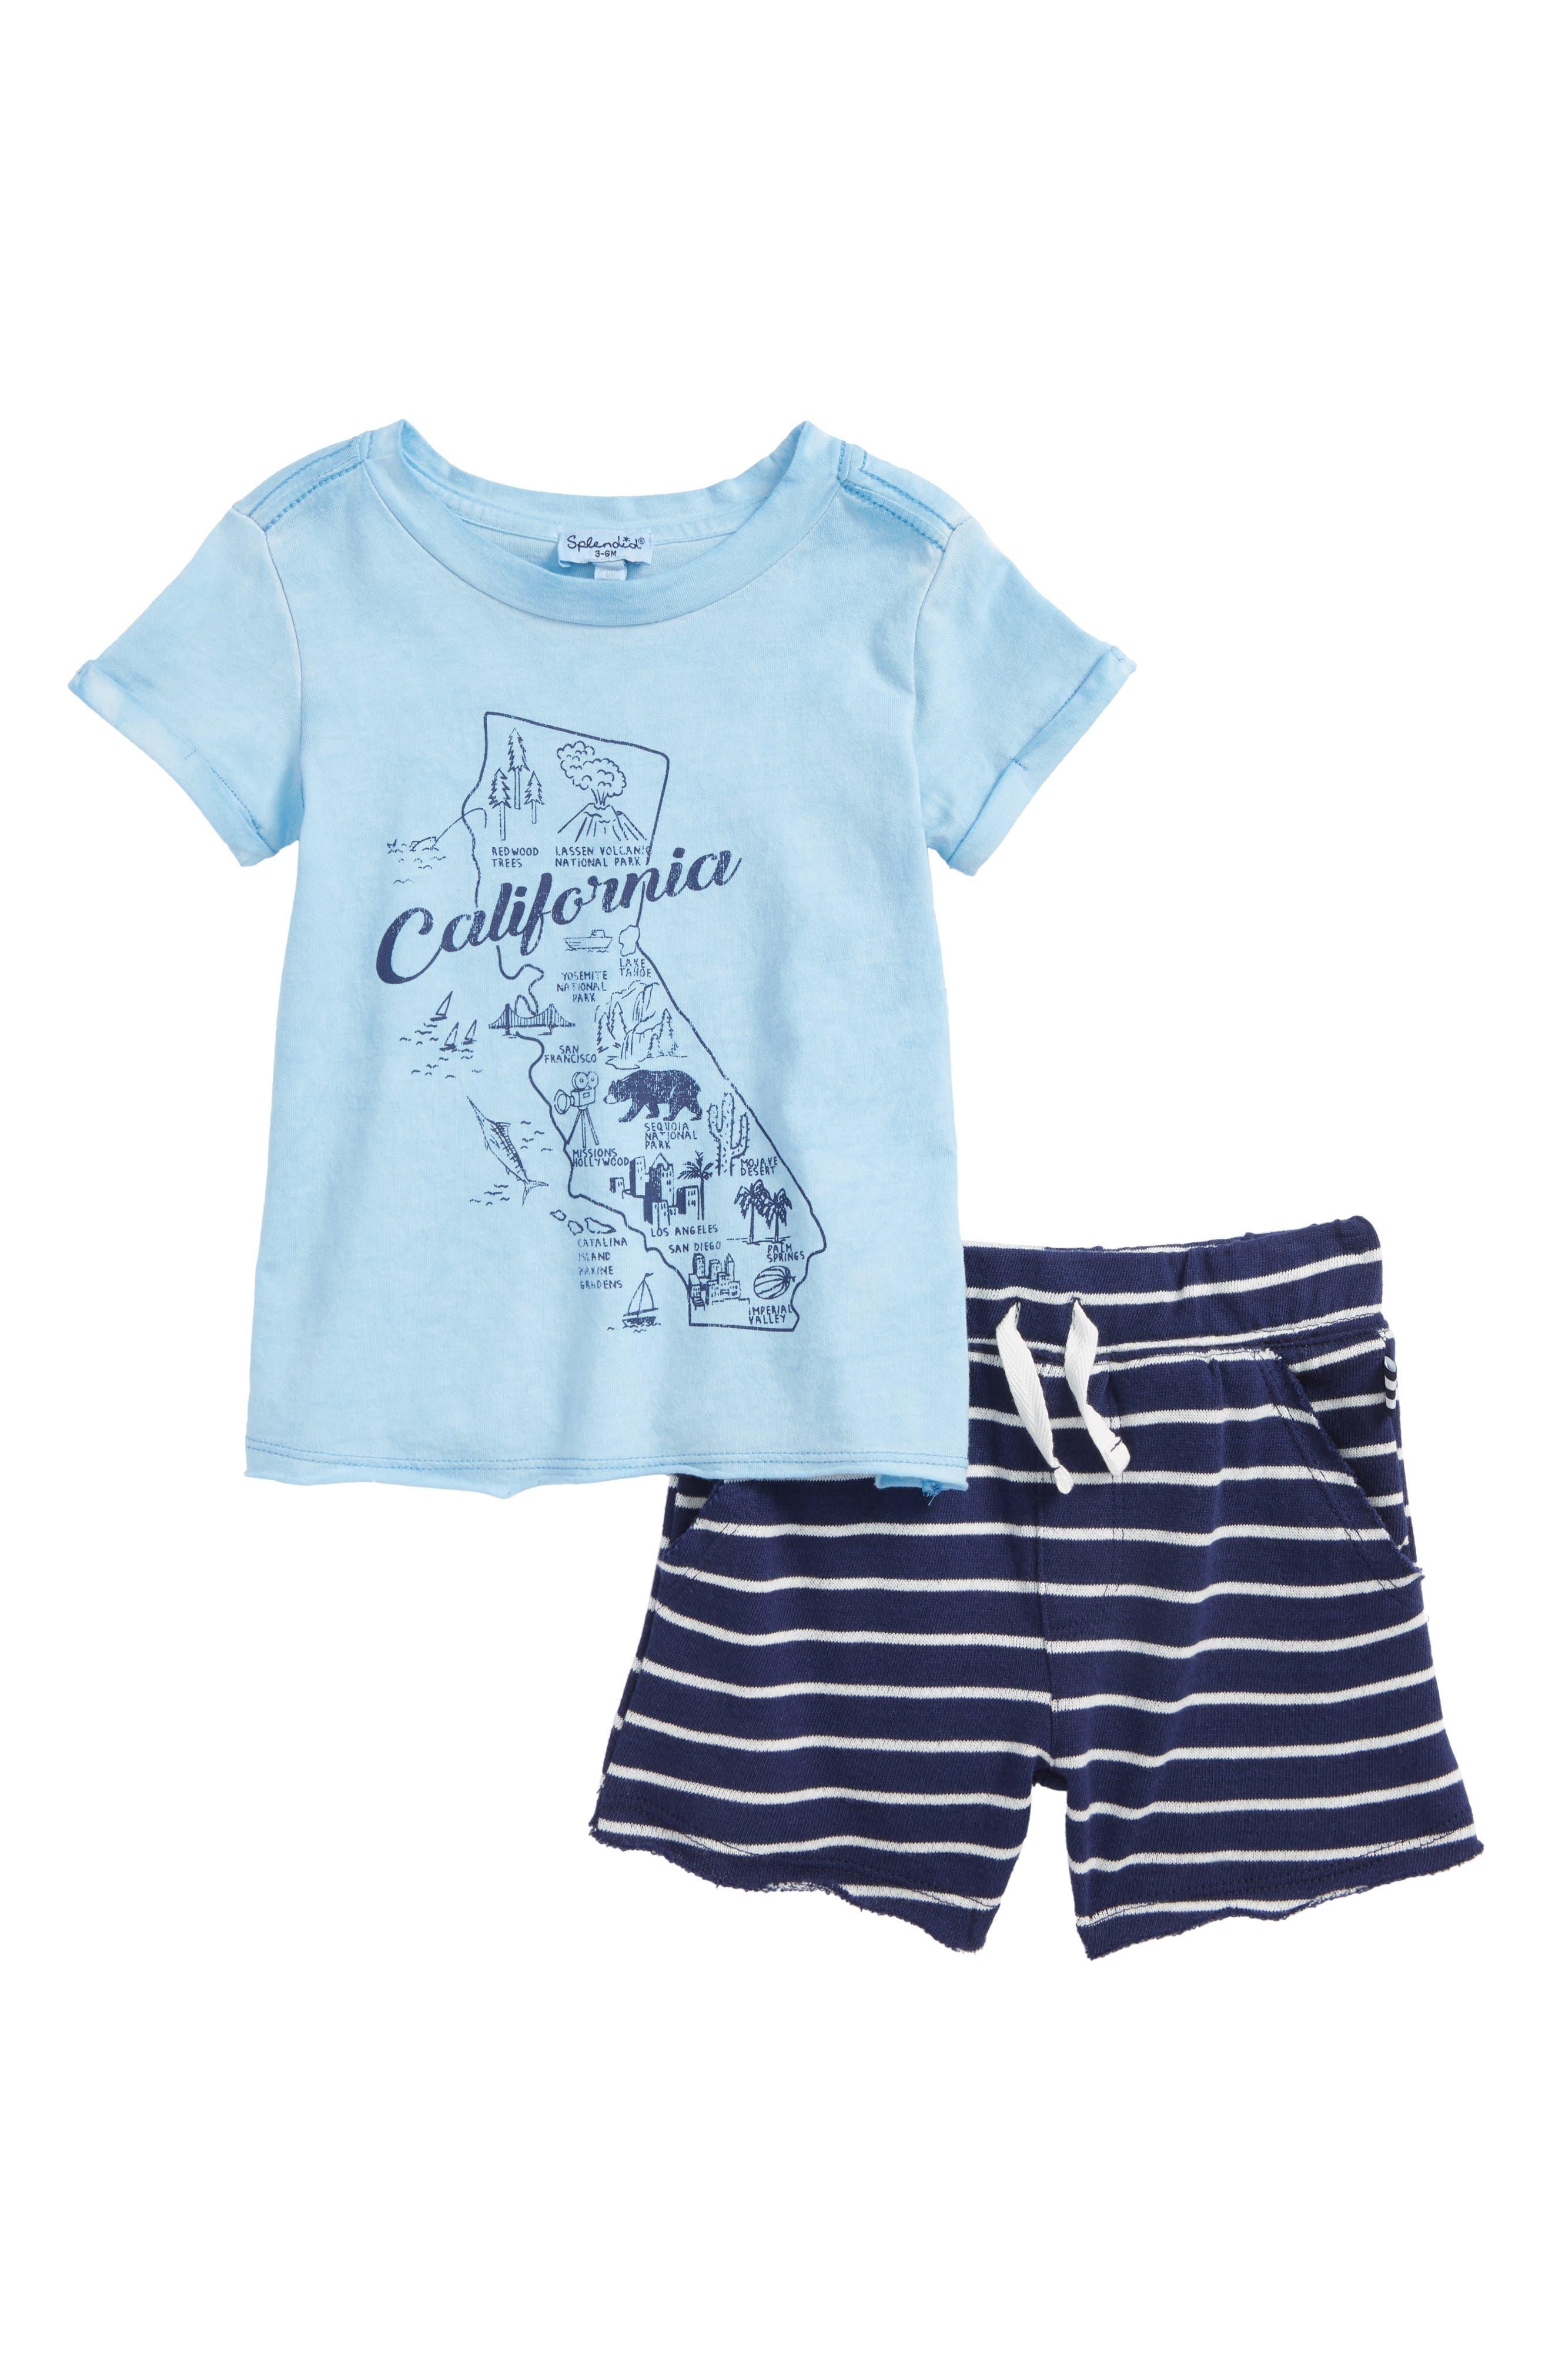 California Map T-Shirt & Shorts Set,                         Main,                         color, Sky Blue